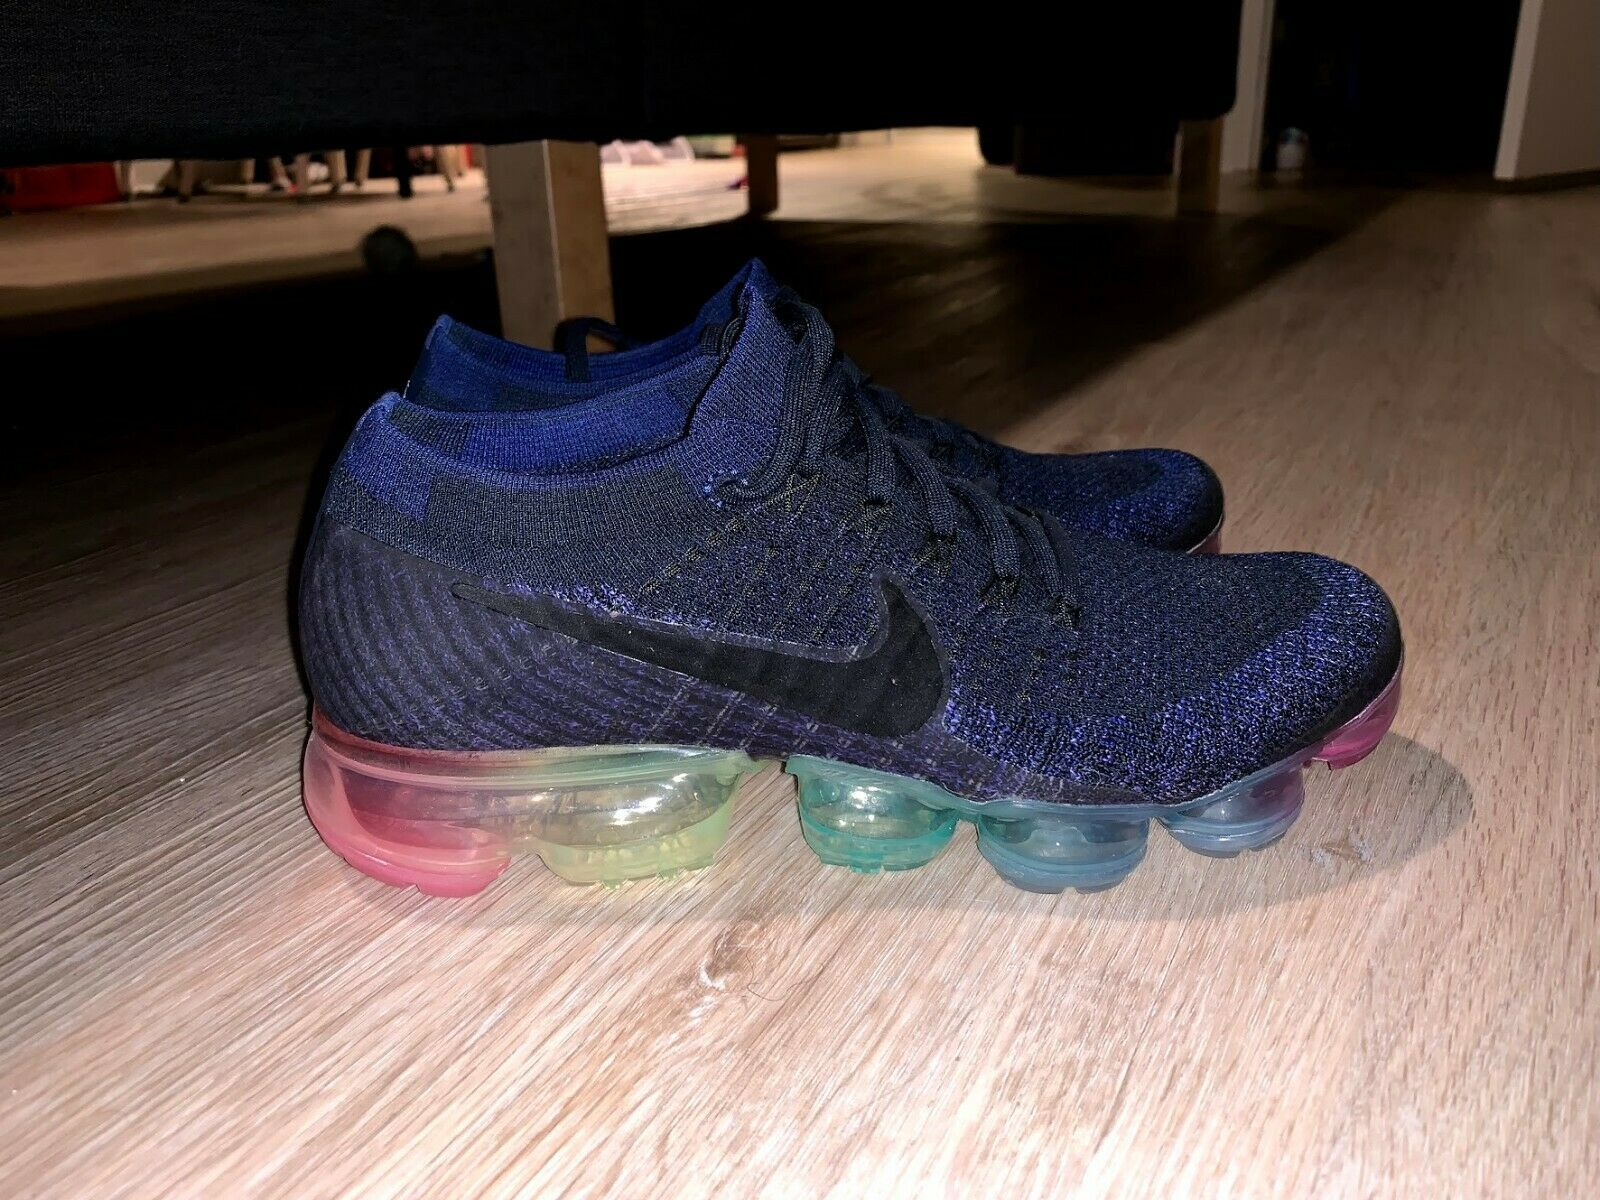 Nike Vapormax 'Be true' Schuh Größe 40 - SELTEN - SEHR GUTER ZUSTAND